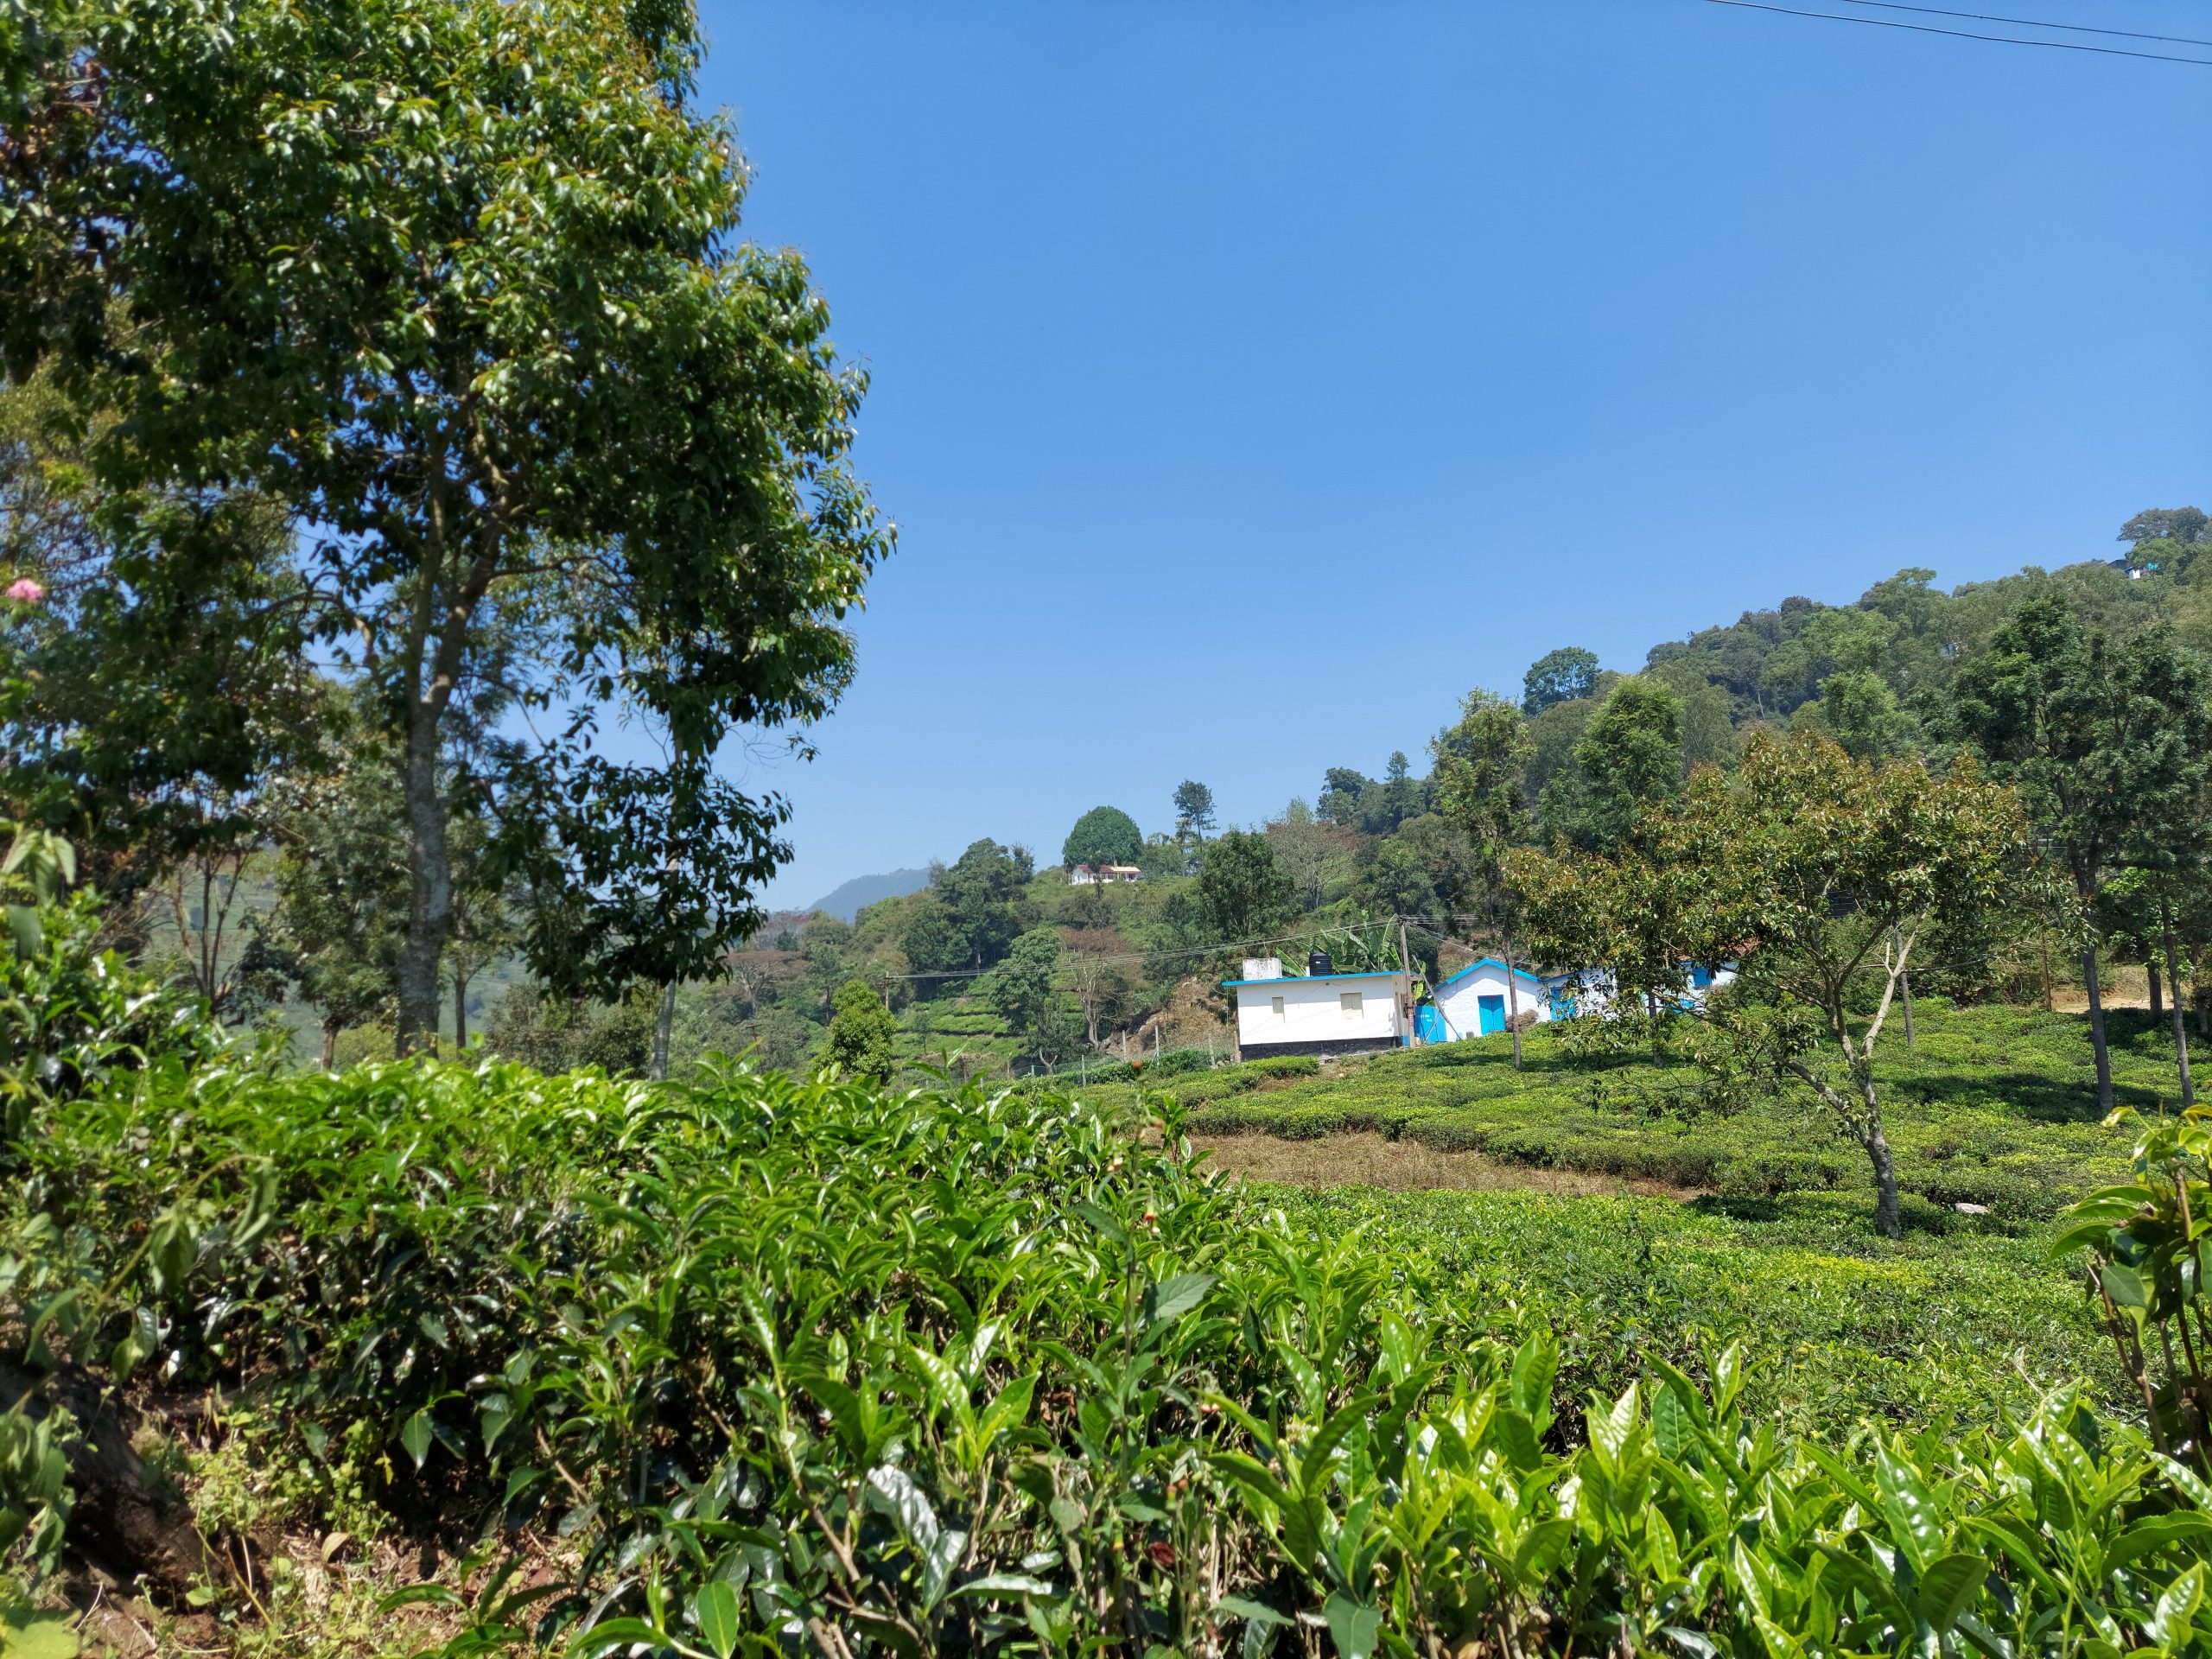 Greenery of a village